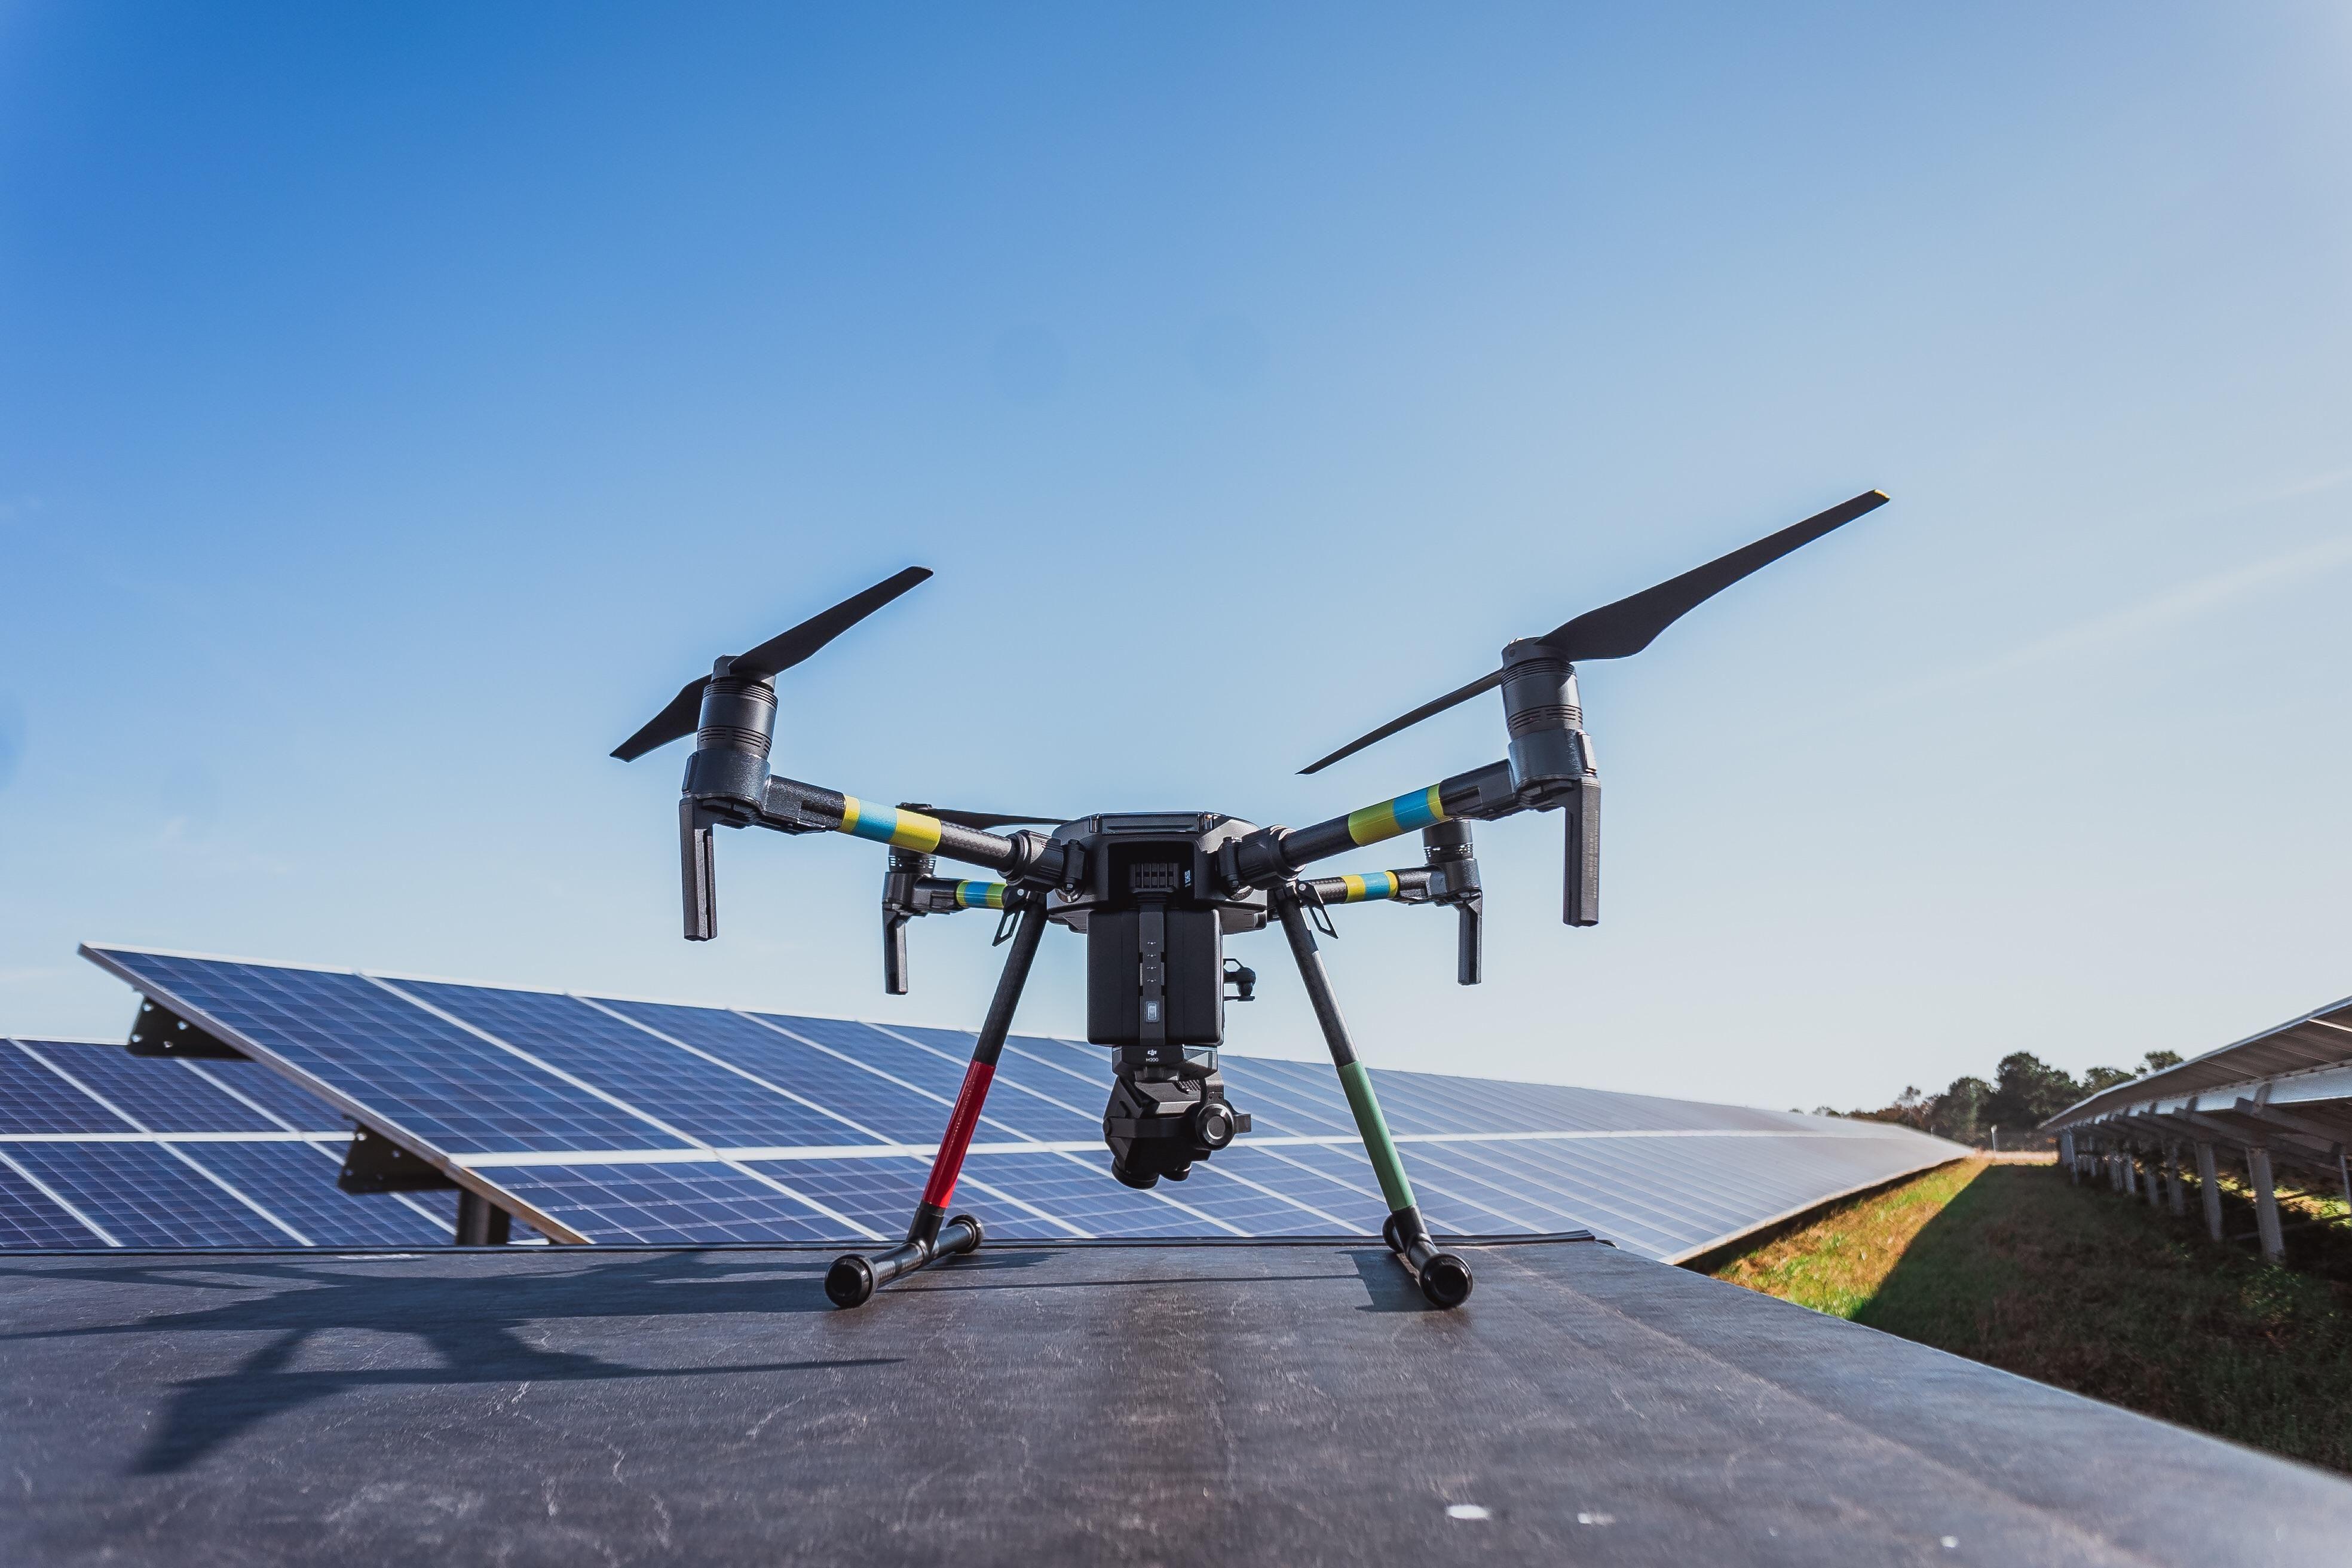 Dji matrice 200 for solar pv inspections drones solar